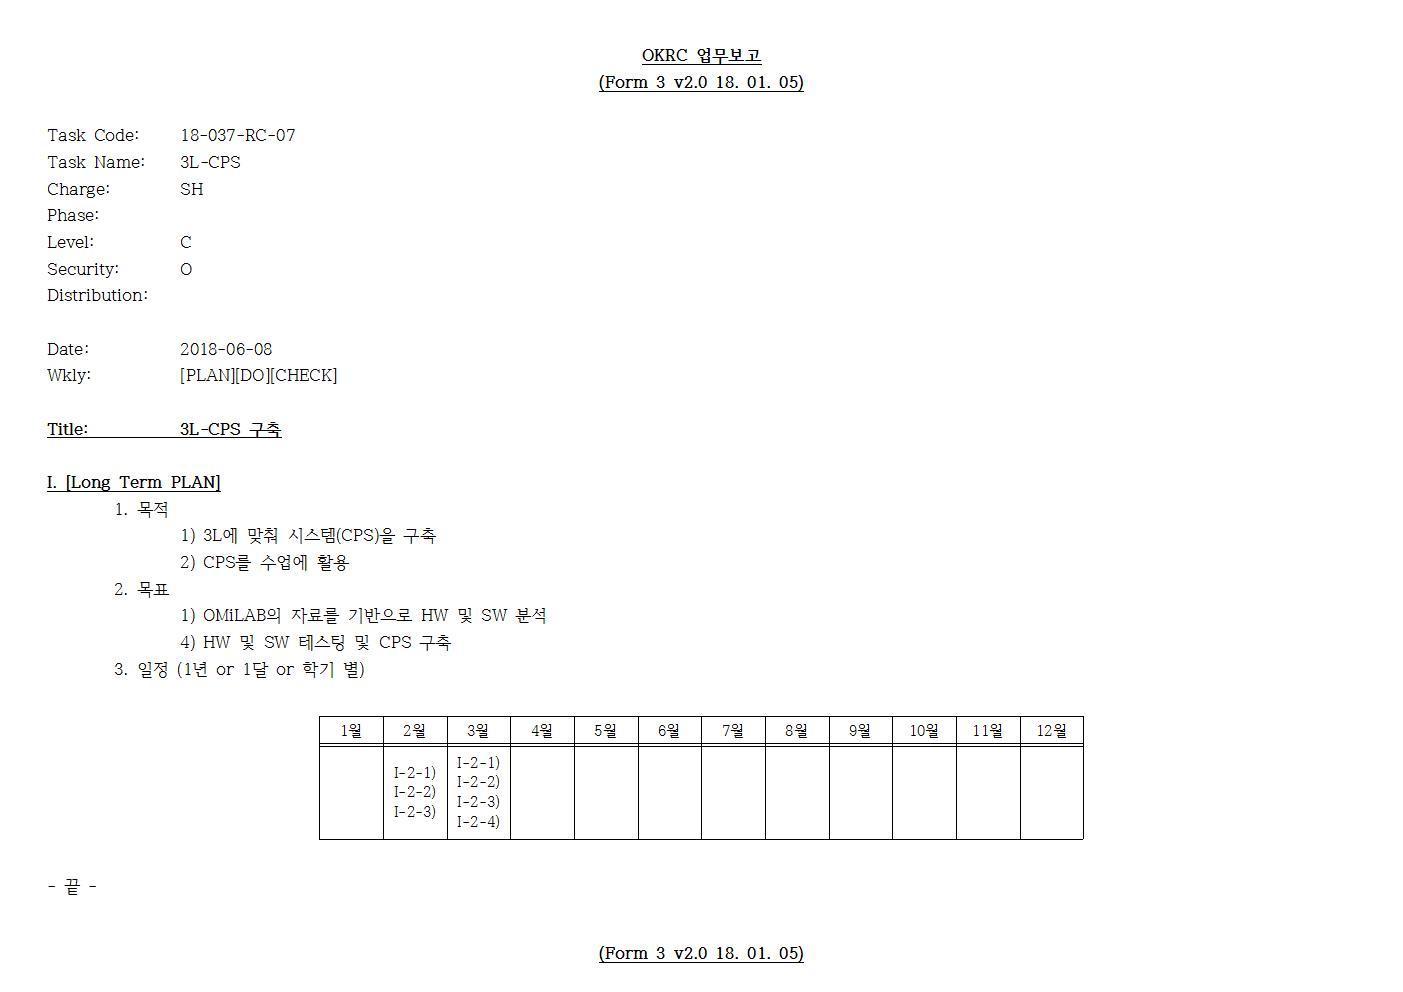 D-[18-037-RC-07]-[3L-CPS]-[2018-06-08][SH]001.jpg